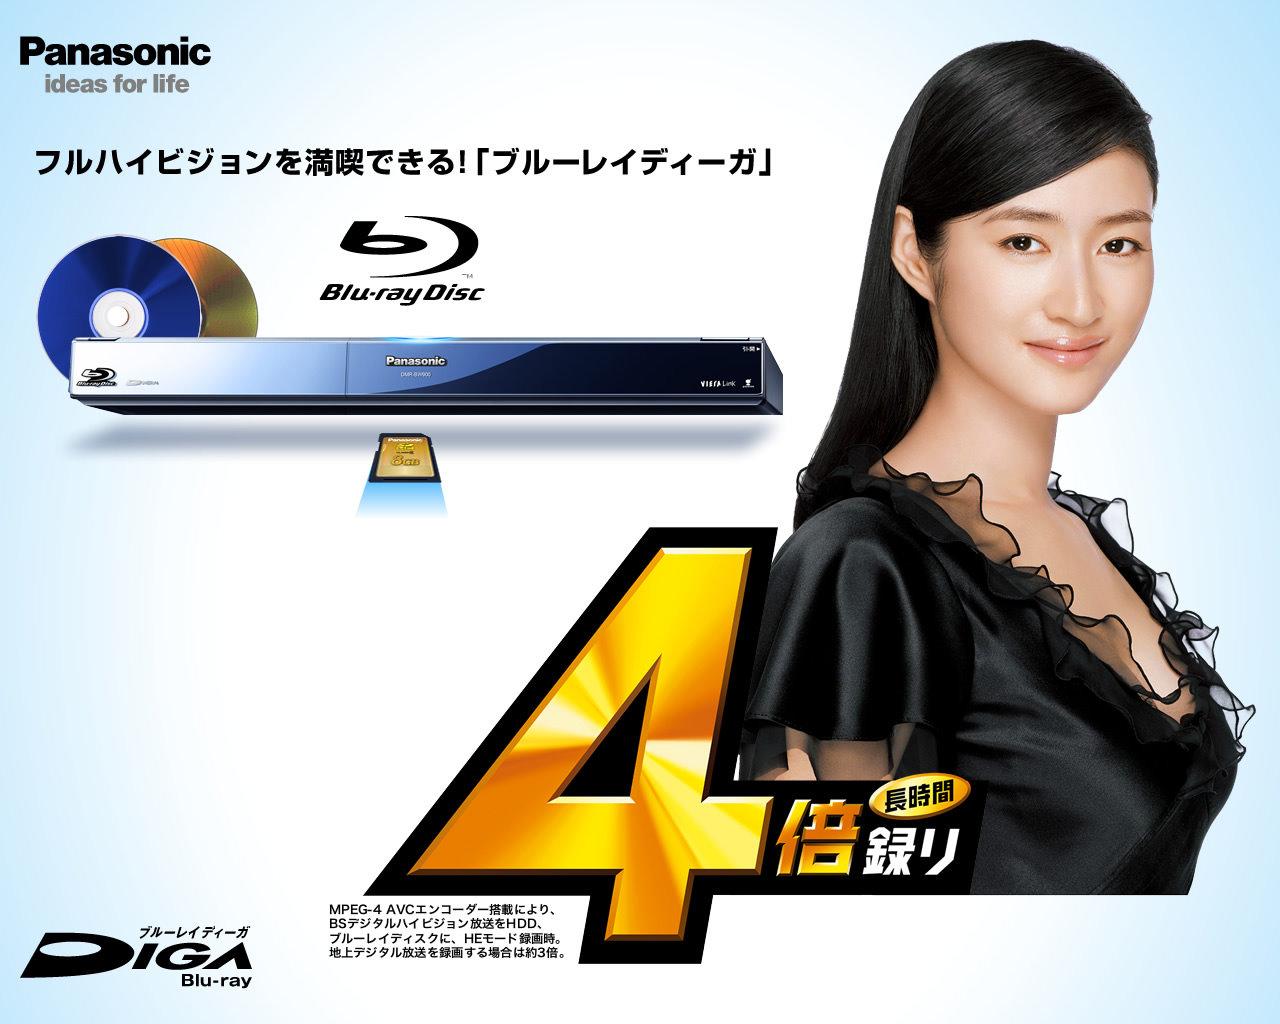 ye321咋了_日本动作片你懂的_ye321com_www日本x片(4)_超级校园网